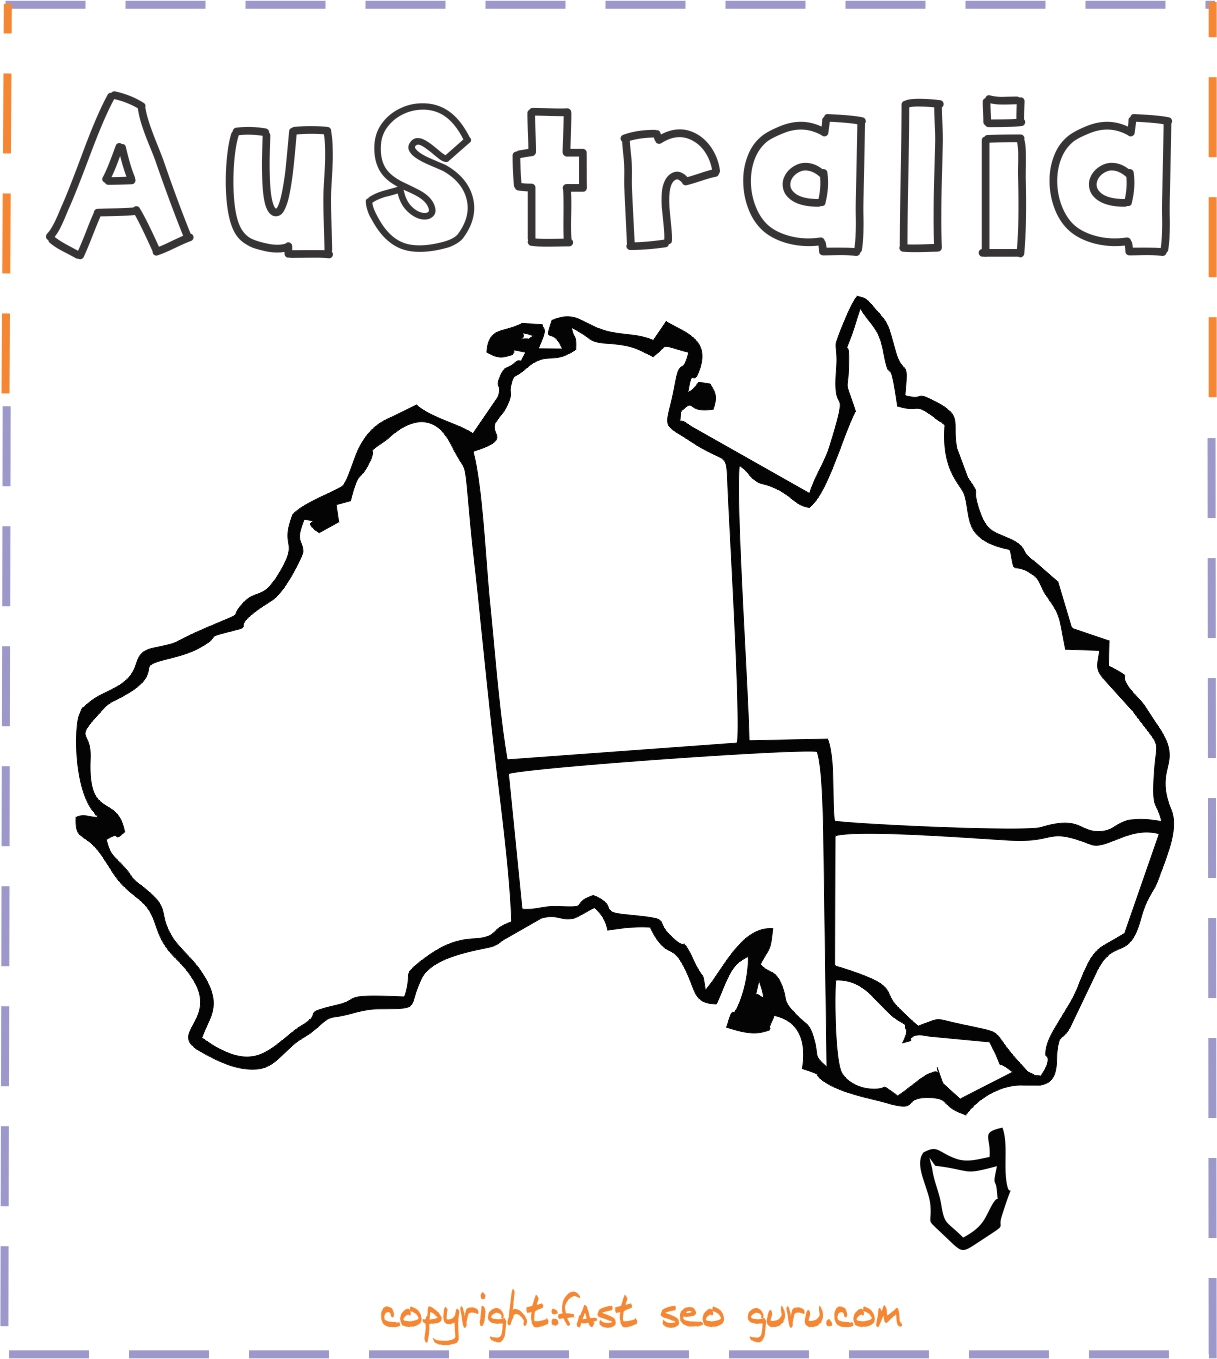 Printable Australia Map Coloring Page